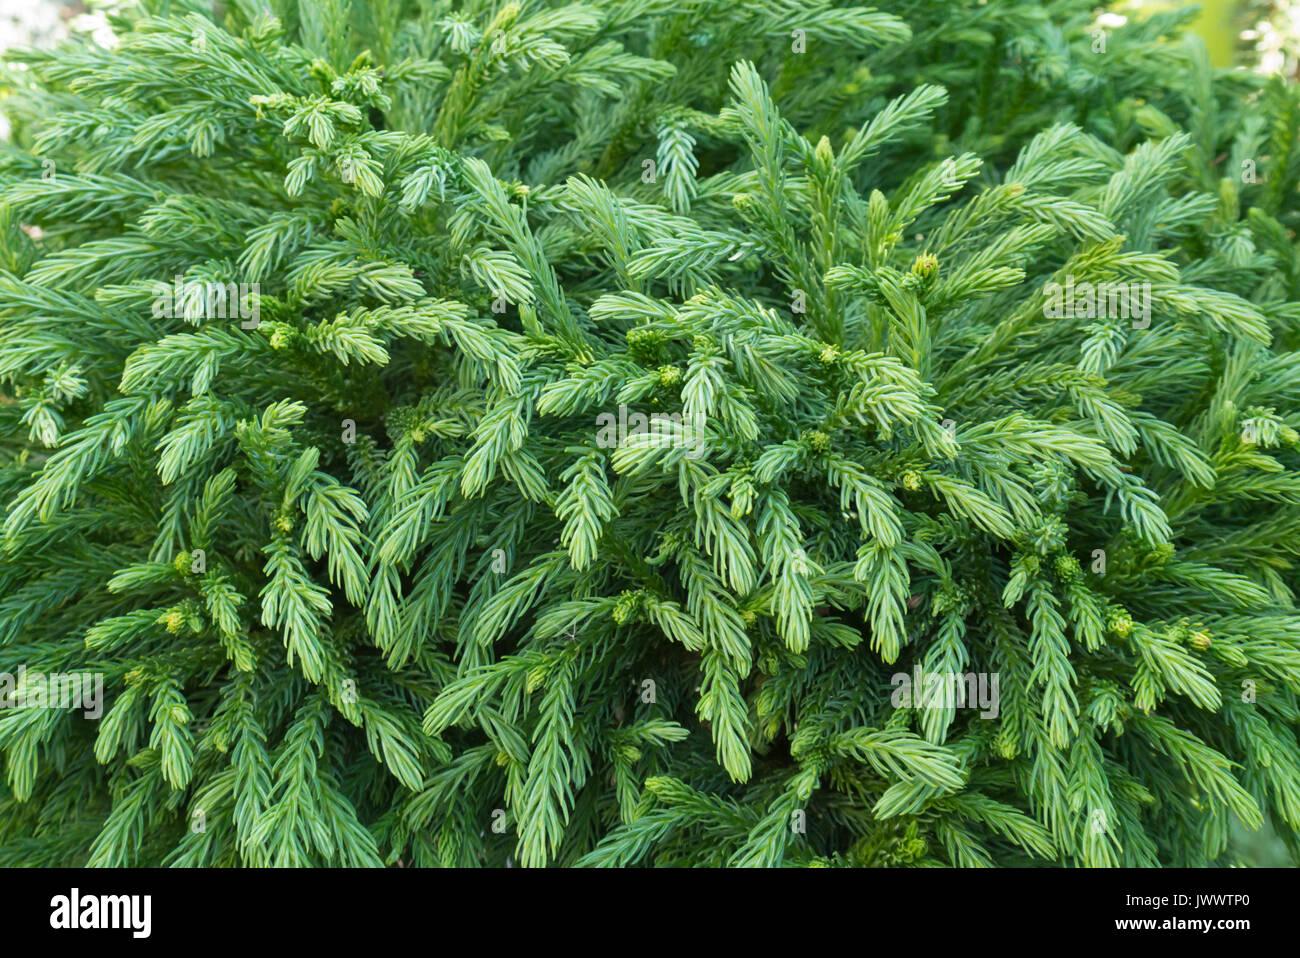 Japanese Cedar Cryptomeria Japonica Globosa Nana Stock Photo